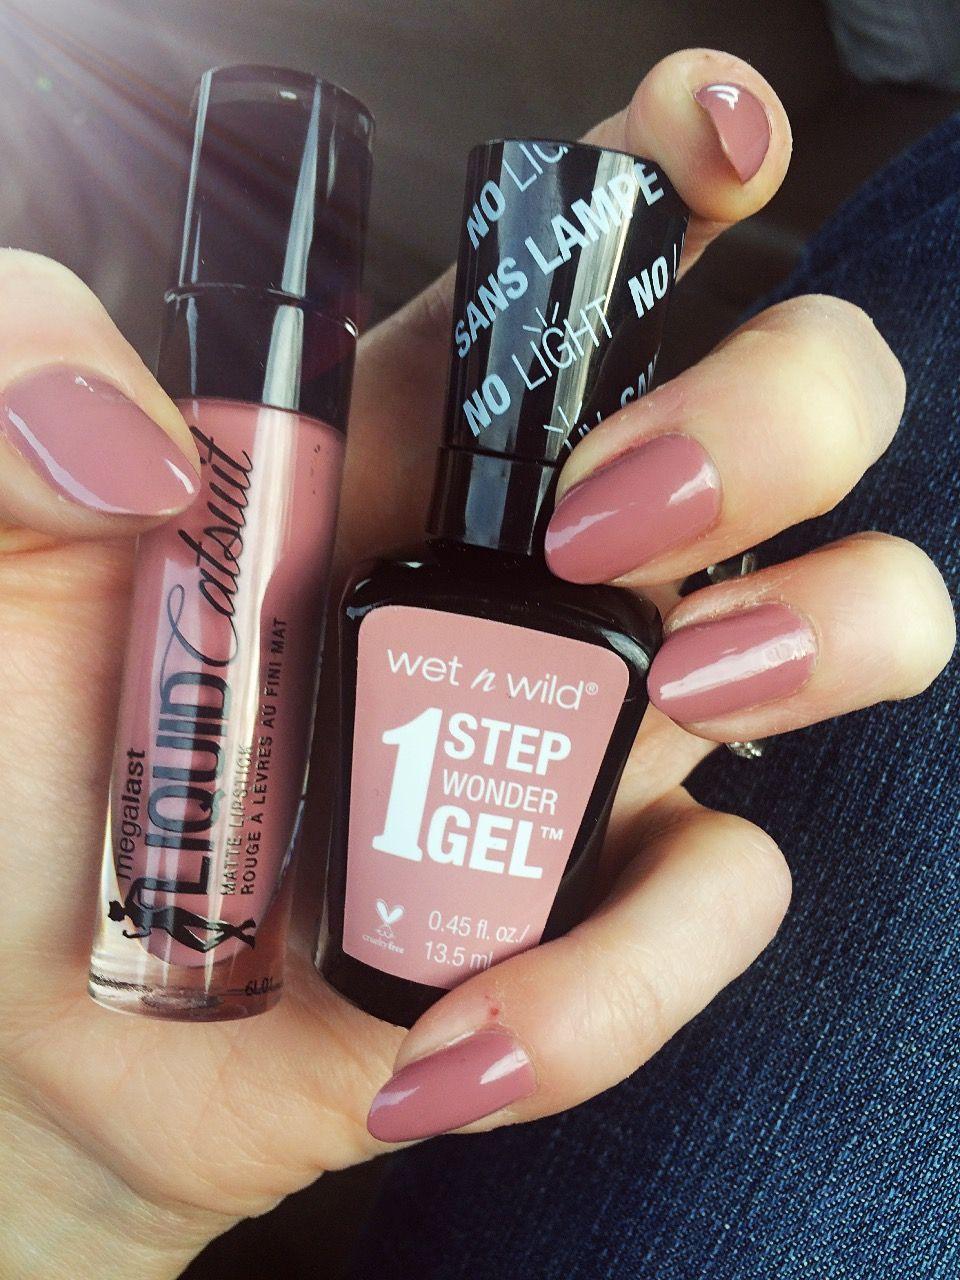 Pin by Crystal Michelle on Nail polish Drugstore nail